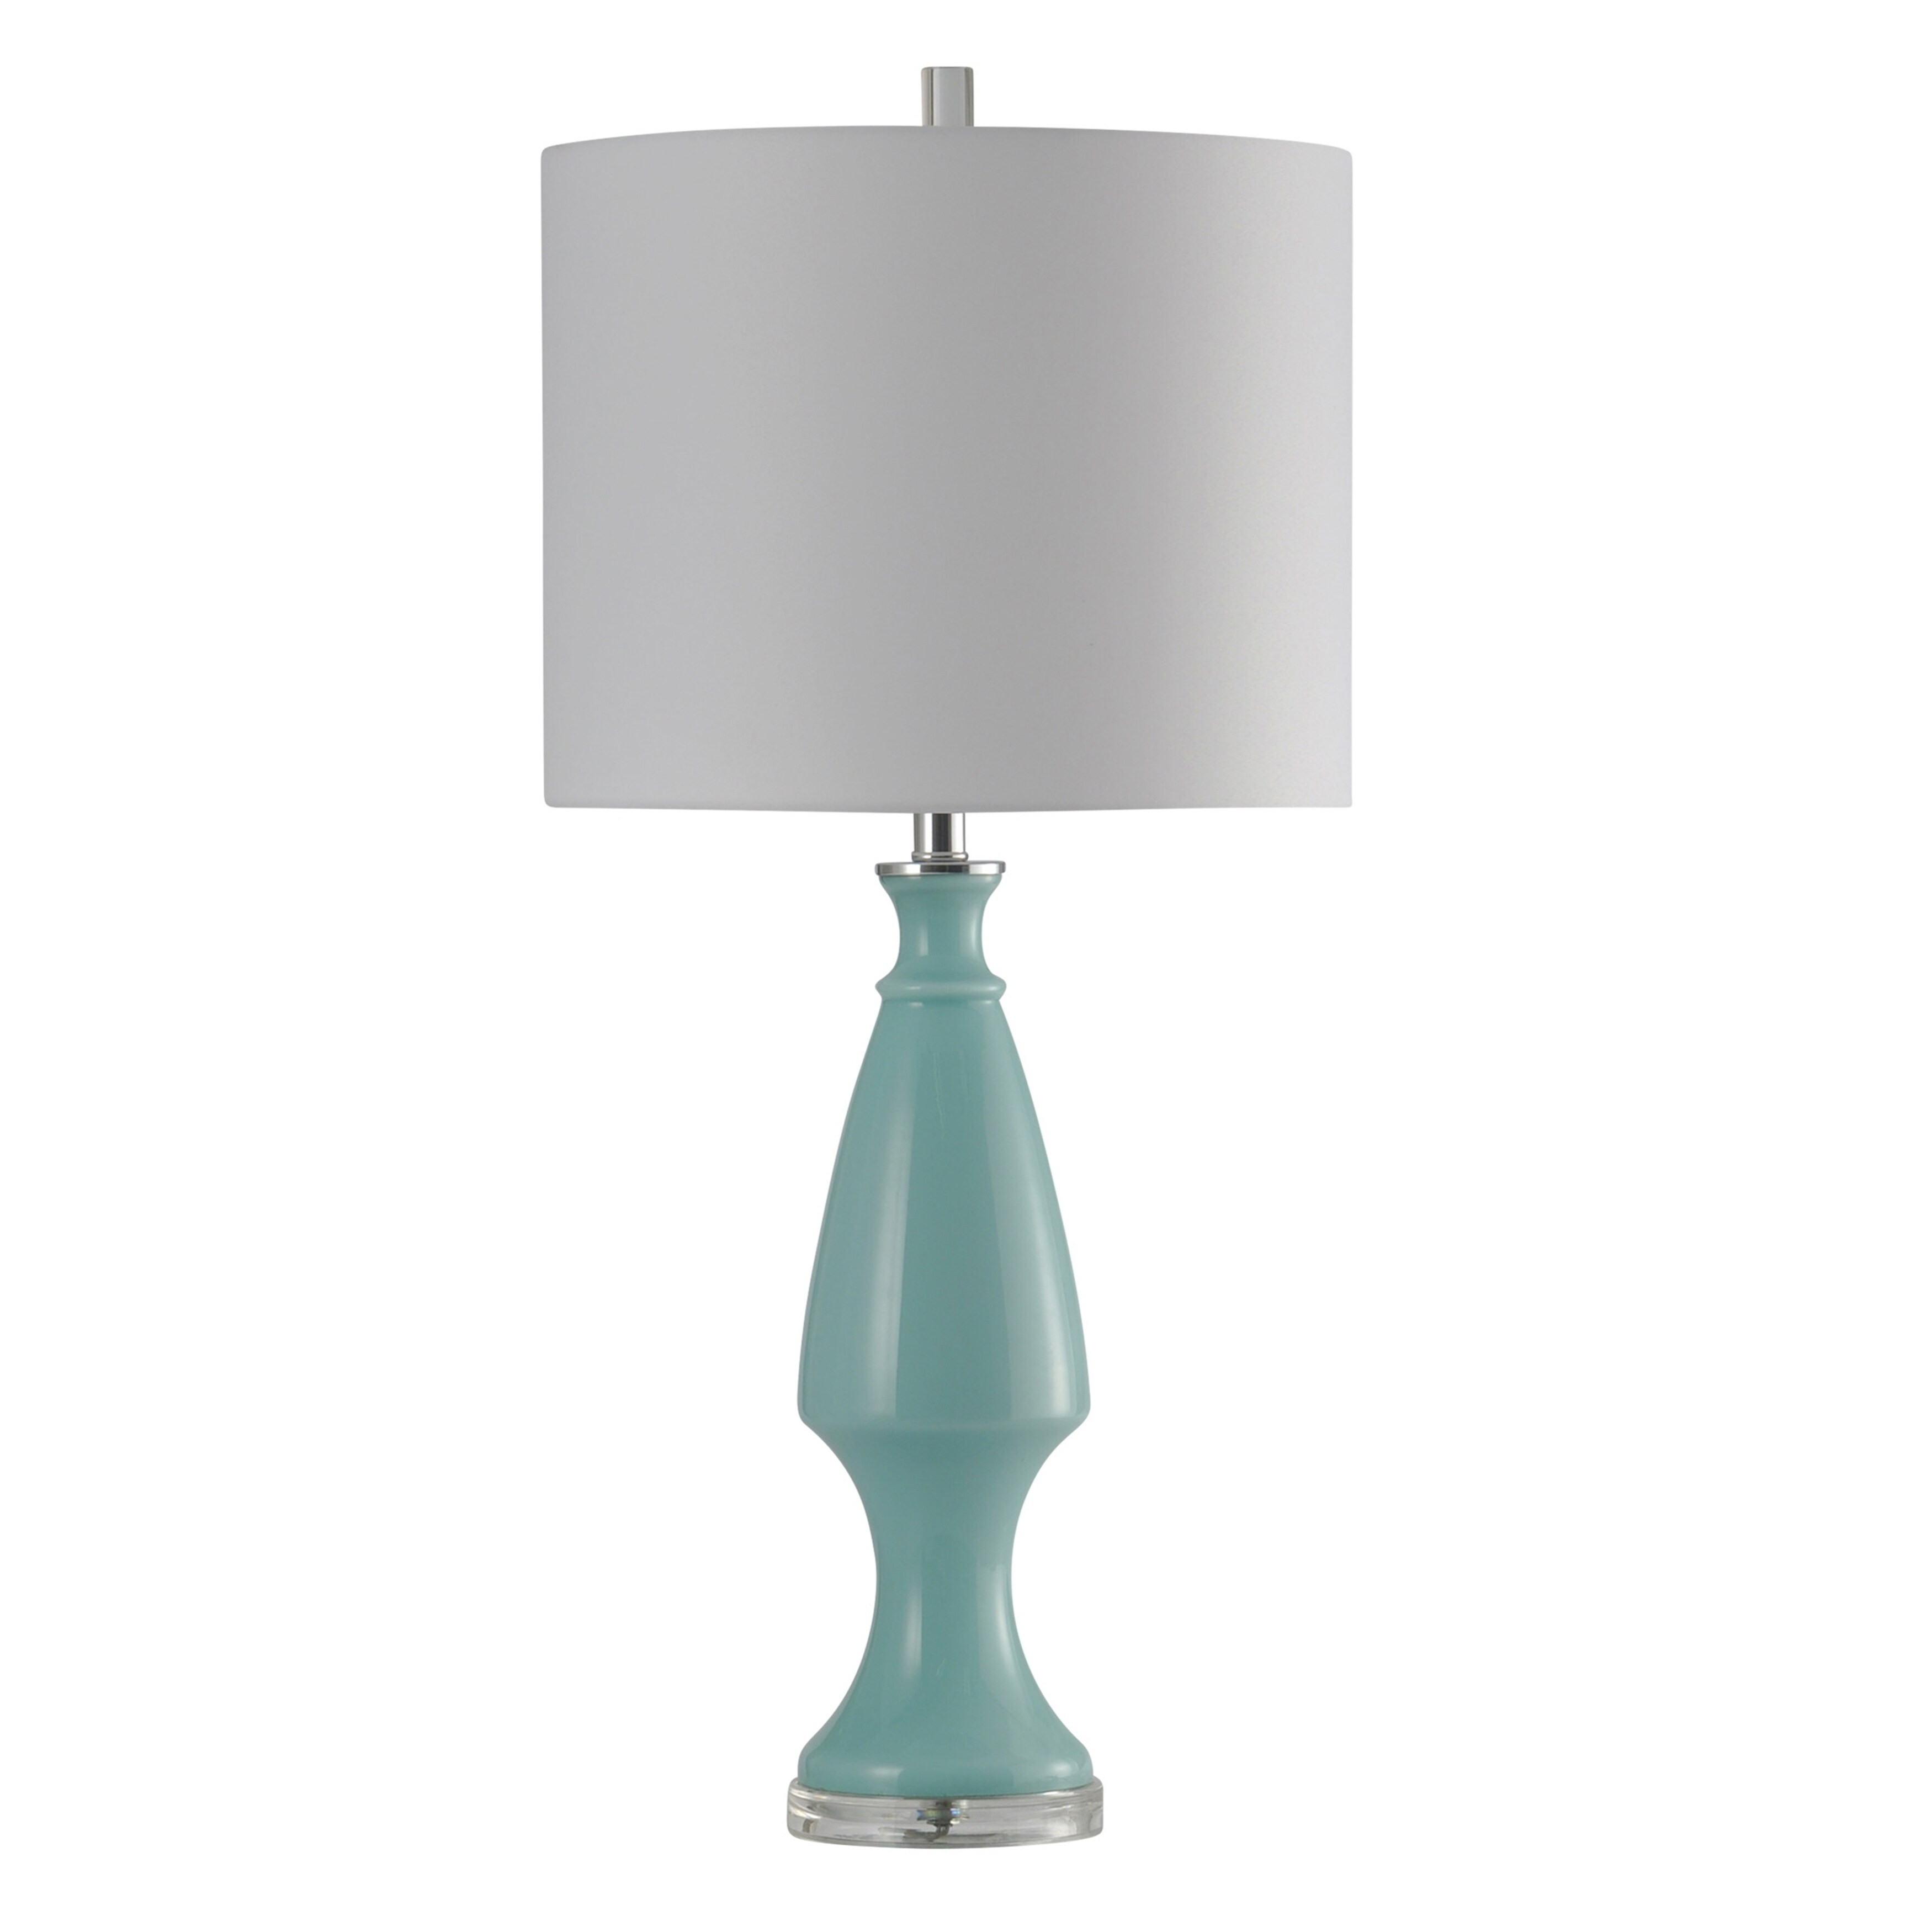 Pantone Light Blue And Chrome Table Lamp White Hardback Fabric Shade Free Shipping Today 20953750